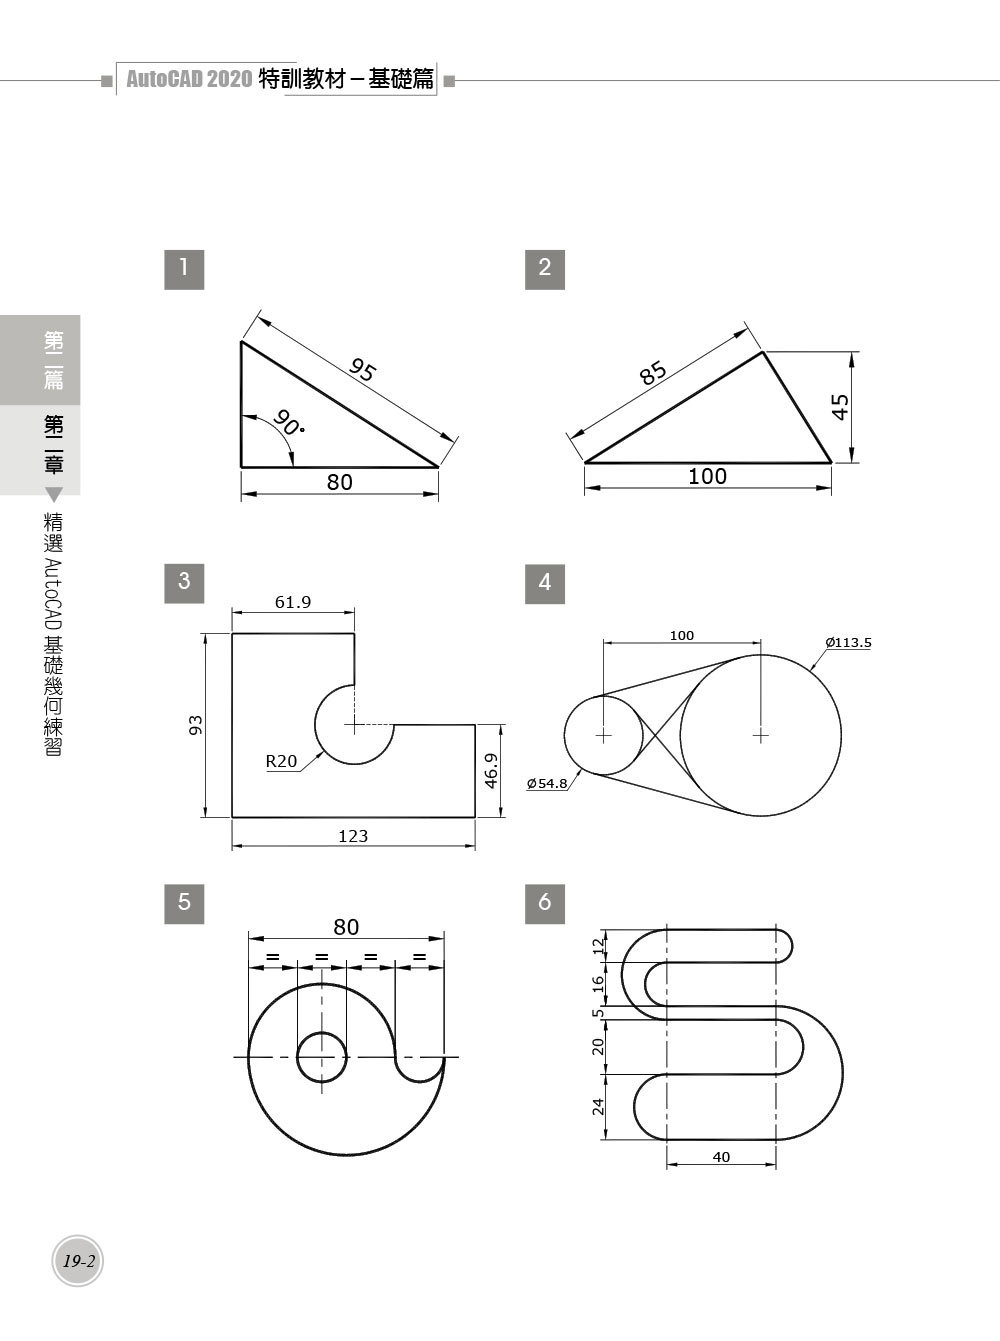 TQC+ AutoCAD 2020 特訓教材 -- 基礎篇 (隨書附贈102個精彩繪圖心法動態教學檔)-preview-7